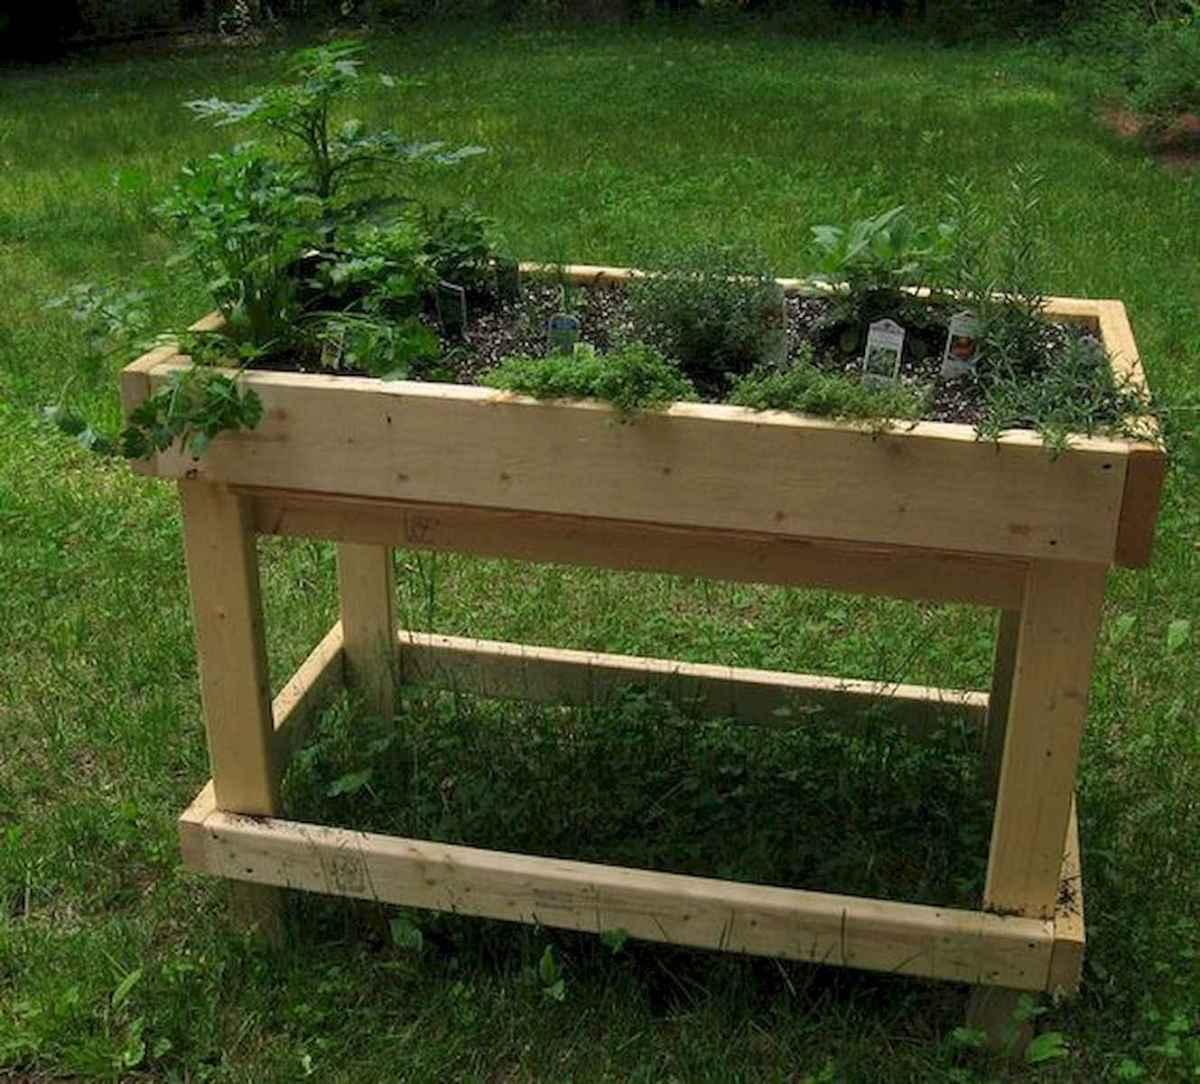 55 Favorite Garden Boxes Raised Design Ideas (52)